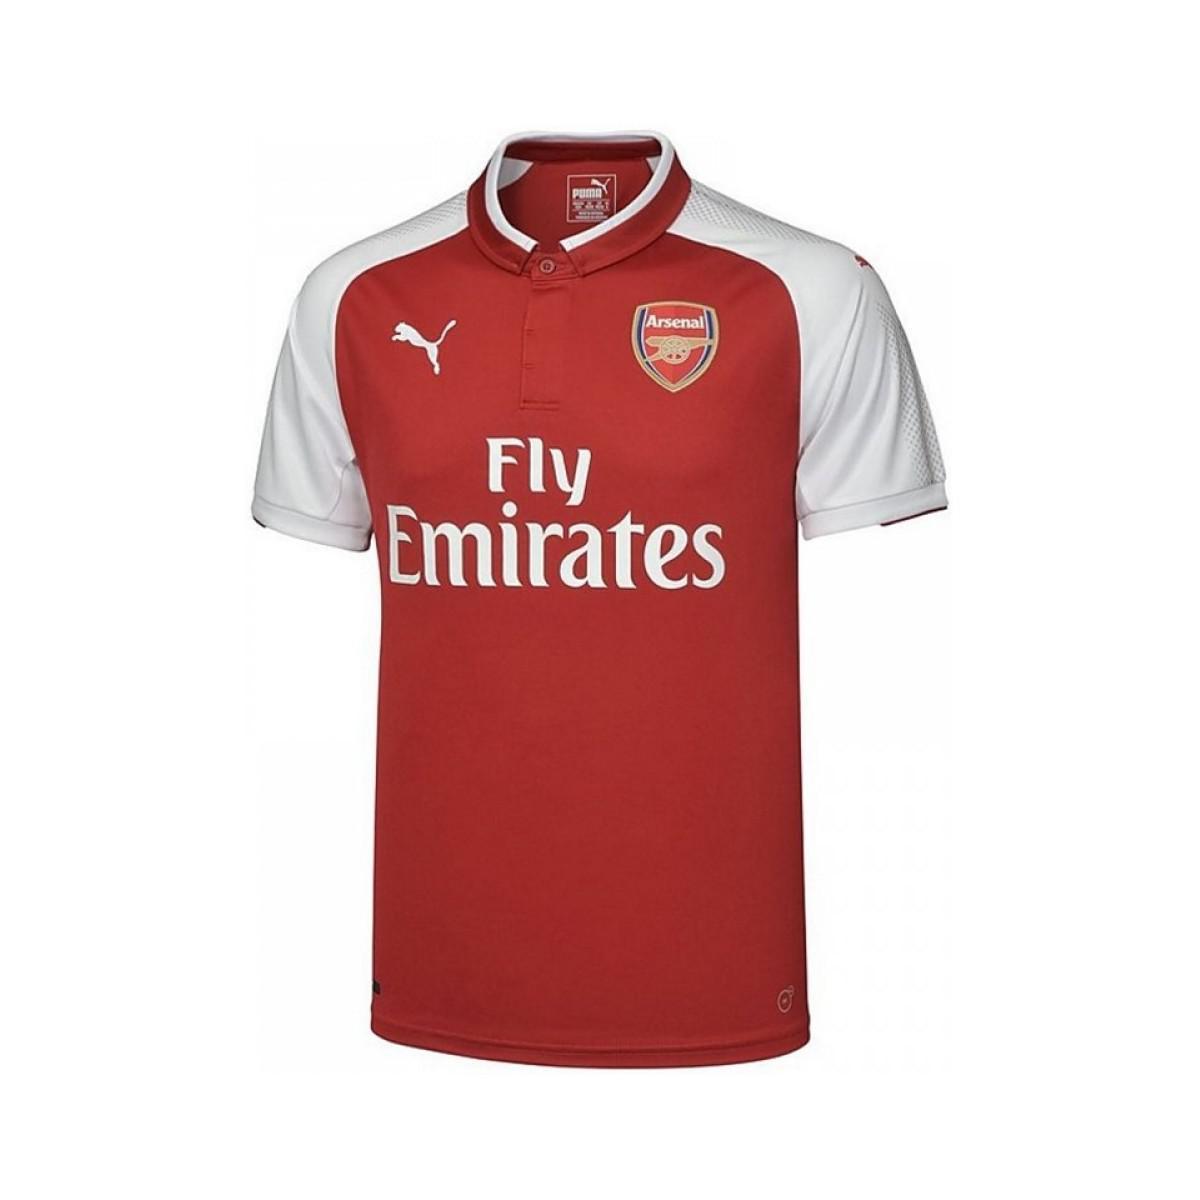 Puma 2017-18 Arsenal Home Shirt - Kids (wilshere 10) Men s Polo ... 18bd7f35d